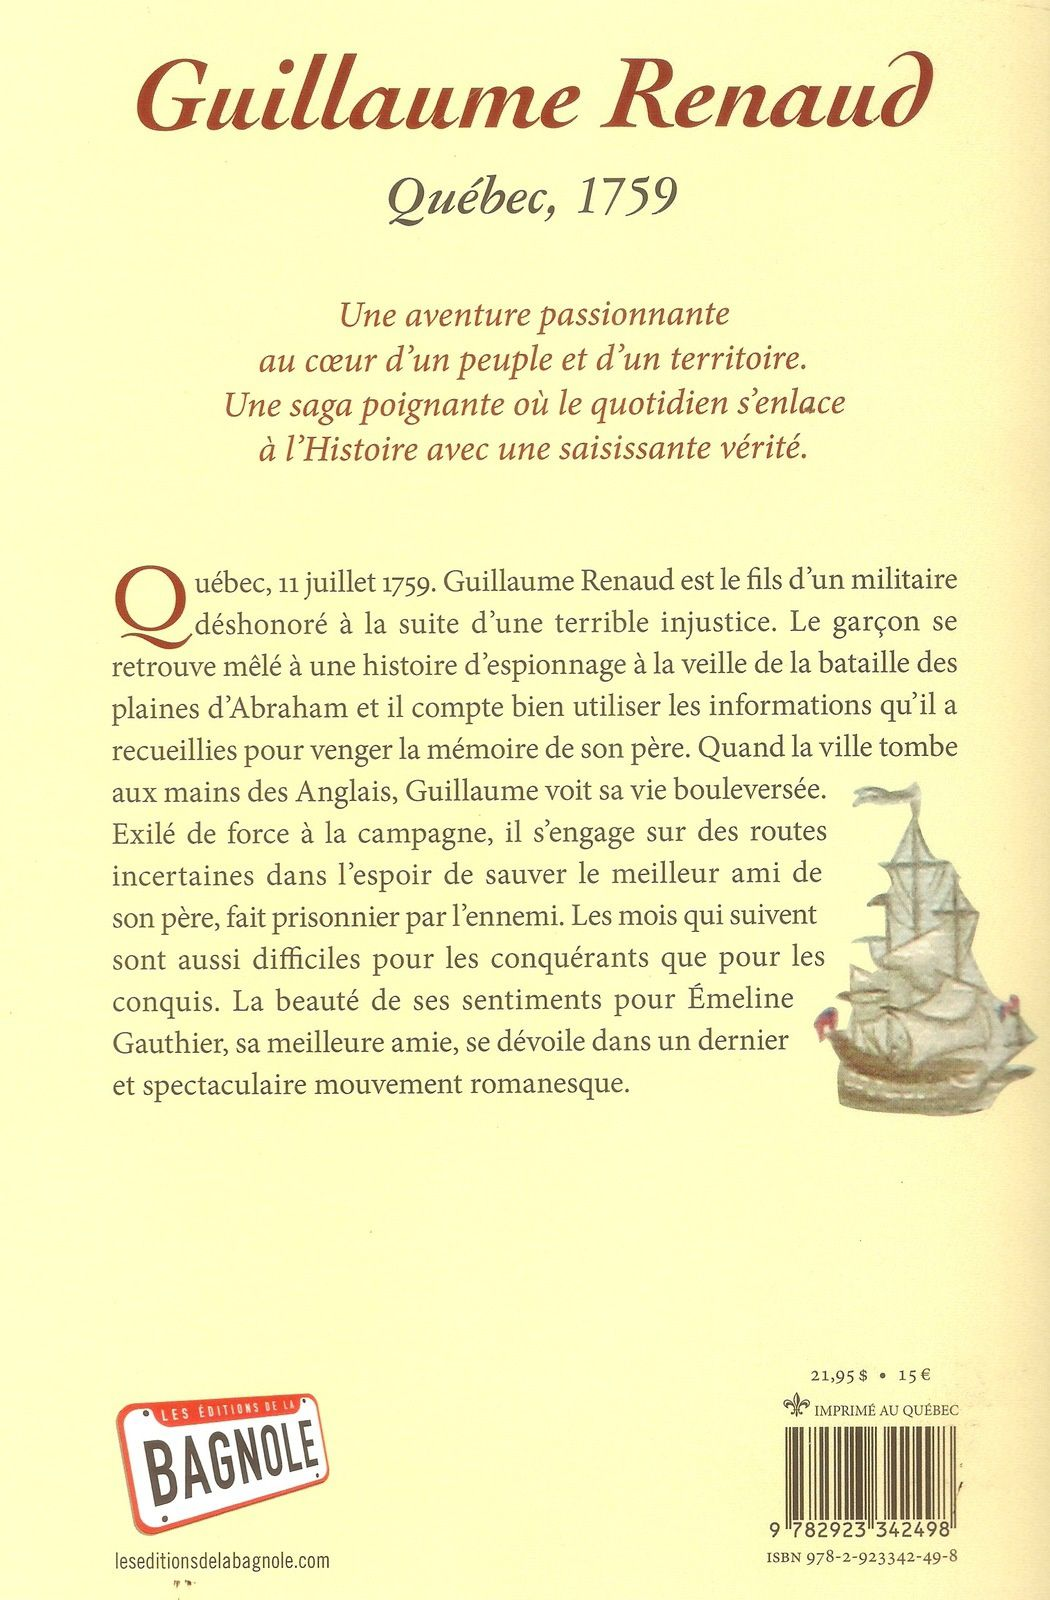 Guillaume Renaud